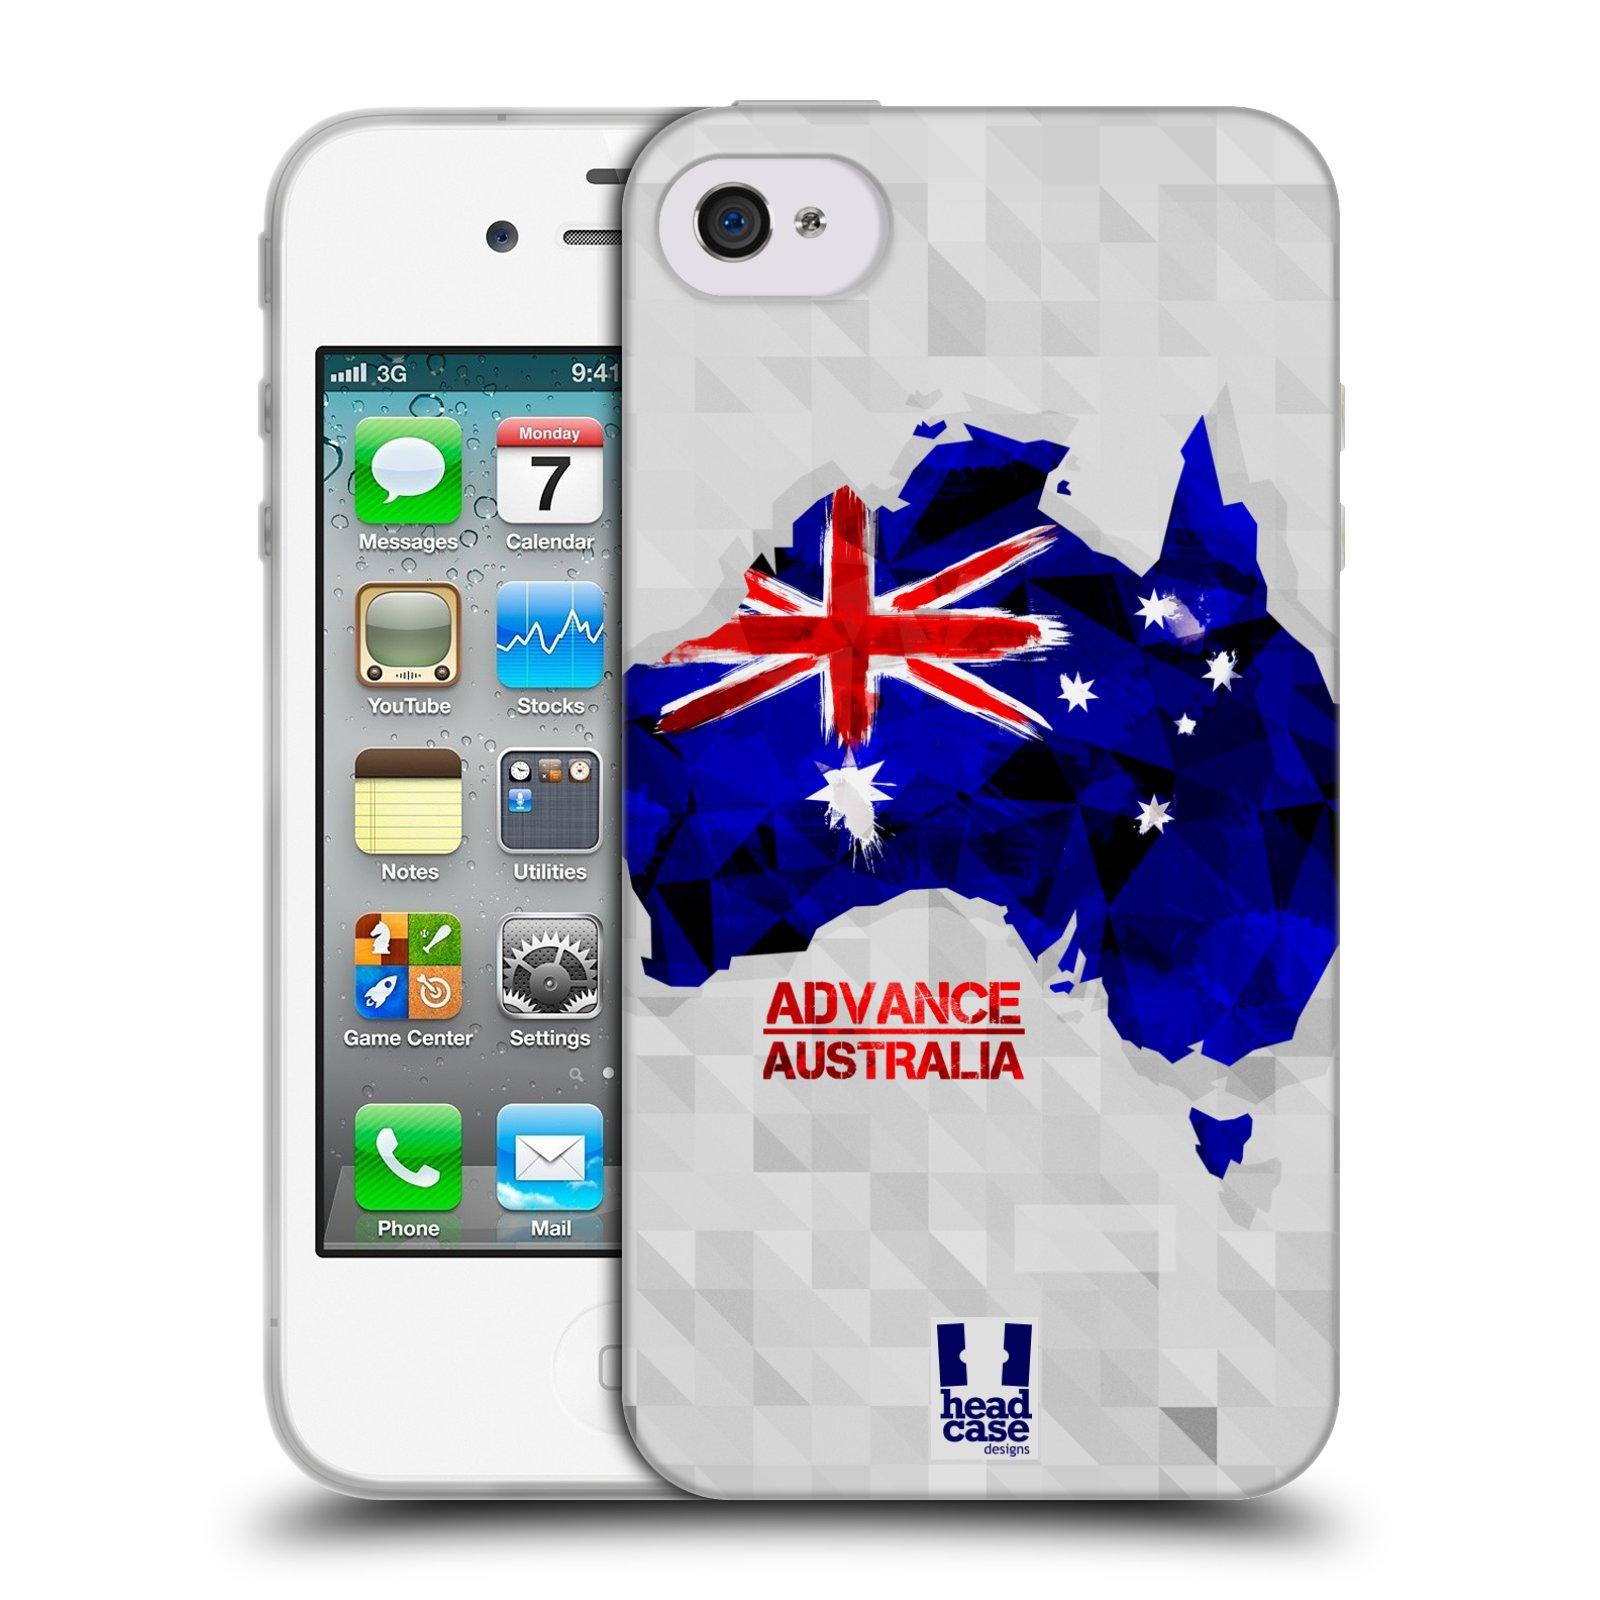 Silikonové pouzdro na mobil Apple iPhone 4 a 4S HEAD CASE GEOMAPA AUSTRÁLIE (Silikonový kryt či obal na mobilní telefon Apple iPhone 4 a 4S)